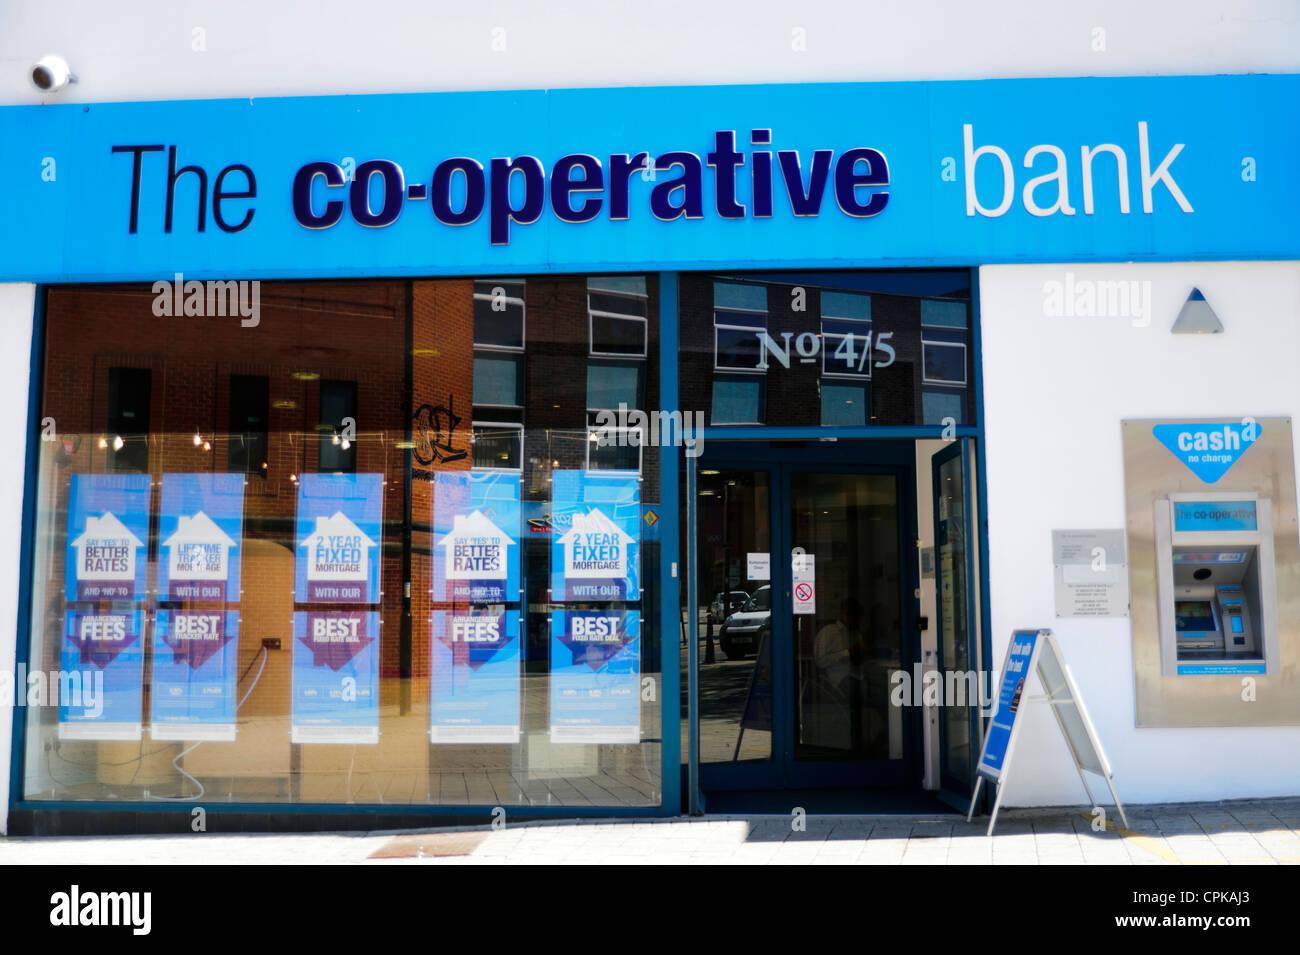 La Co-operative Bank à Swindon, Royaume-Uni. Photo Stock